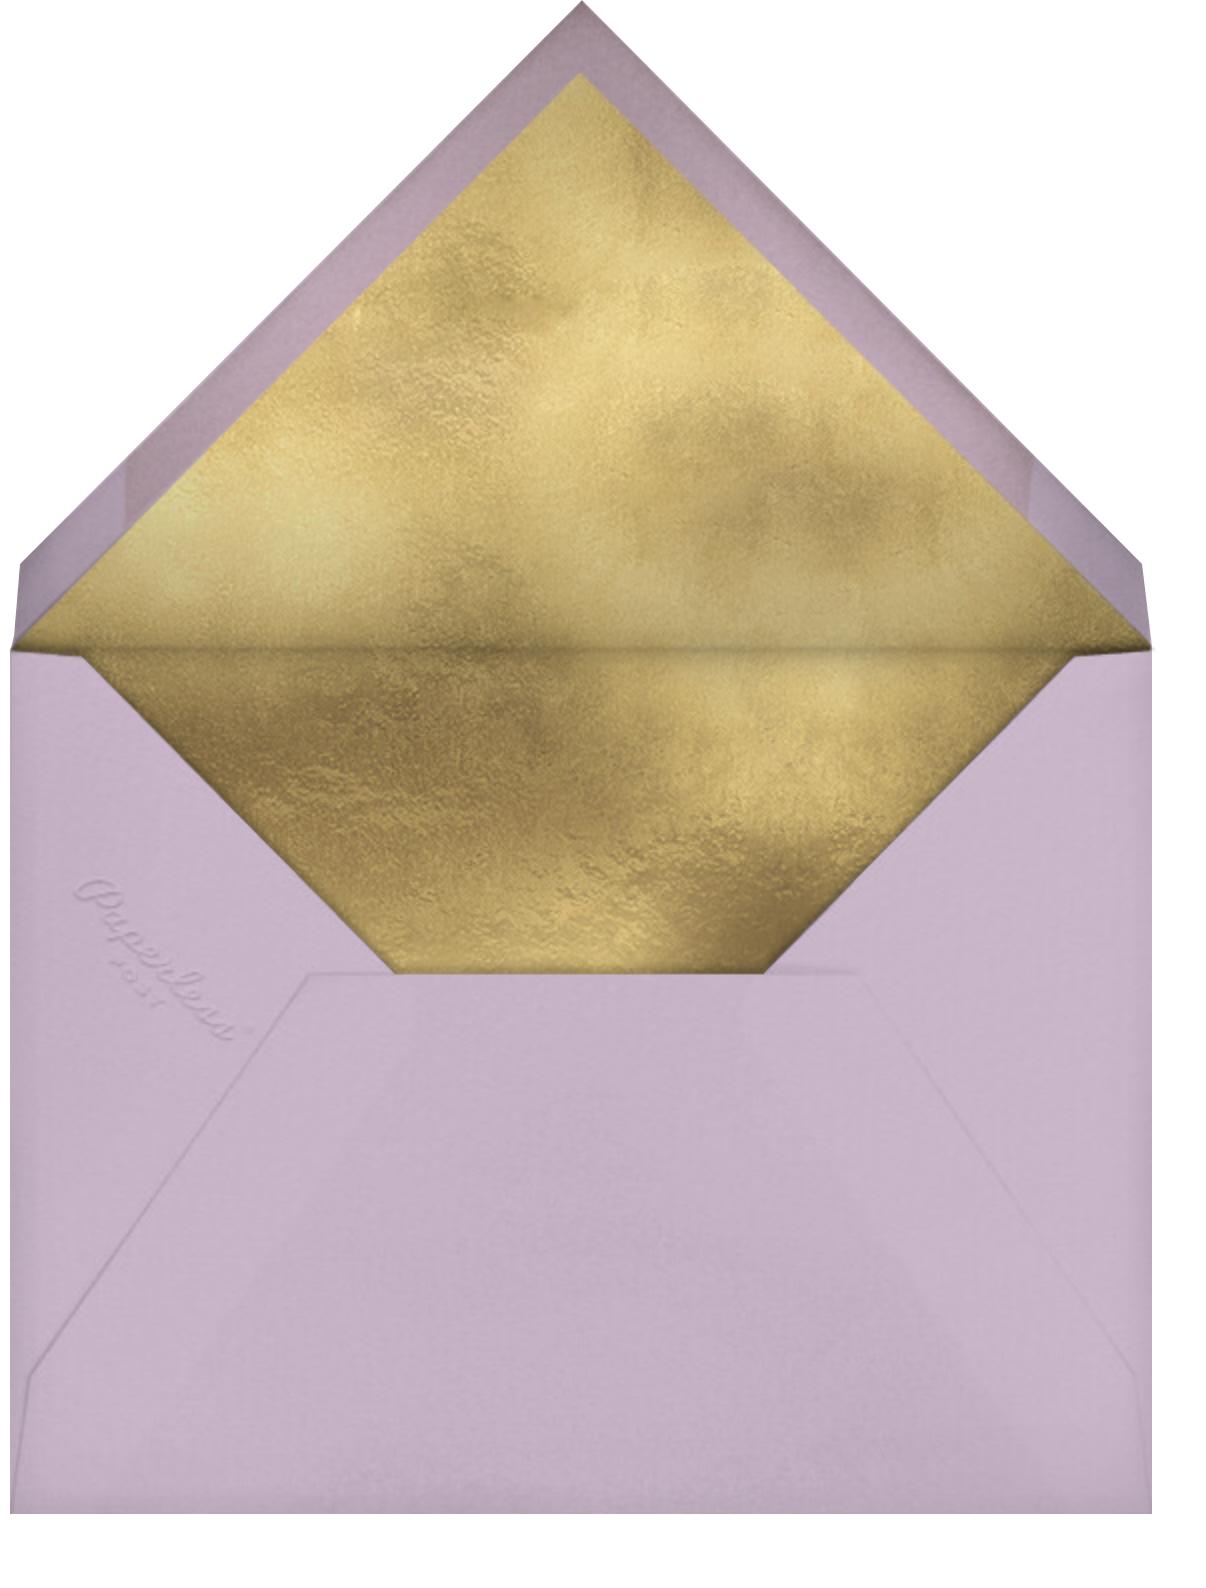 Sea Breeze - White - kate spade new york - Envelope